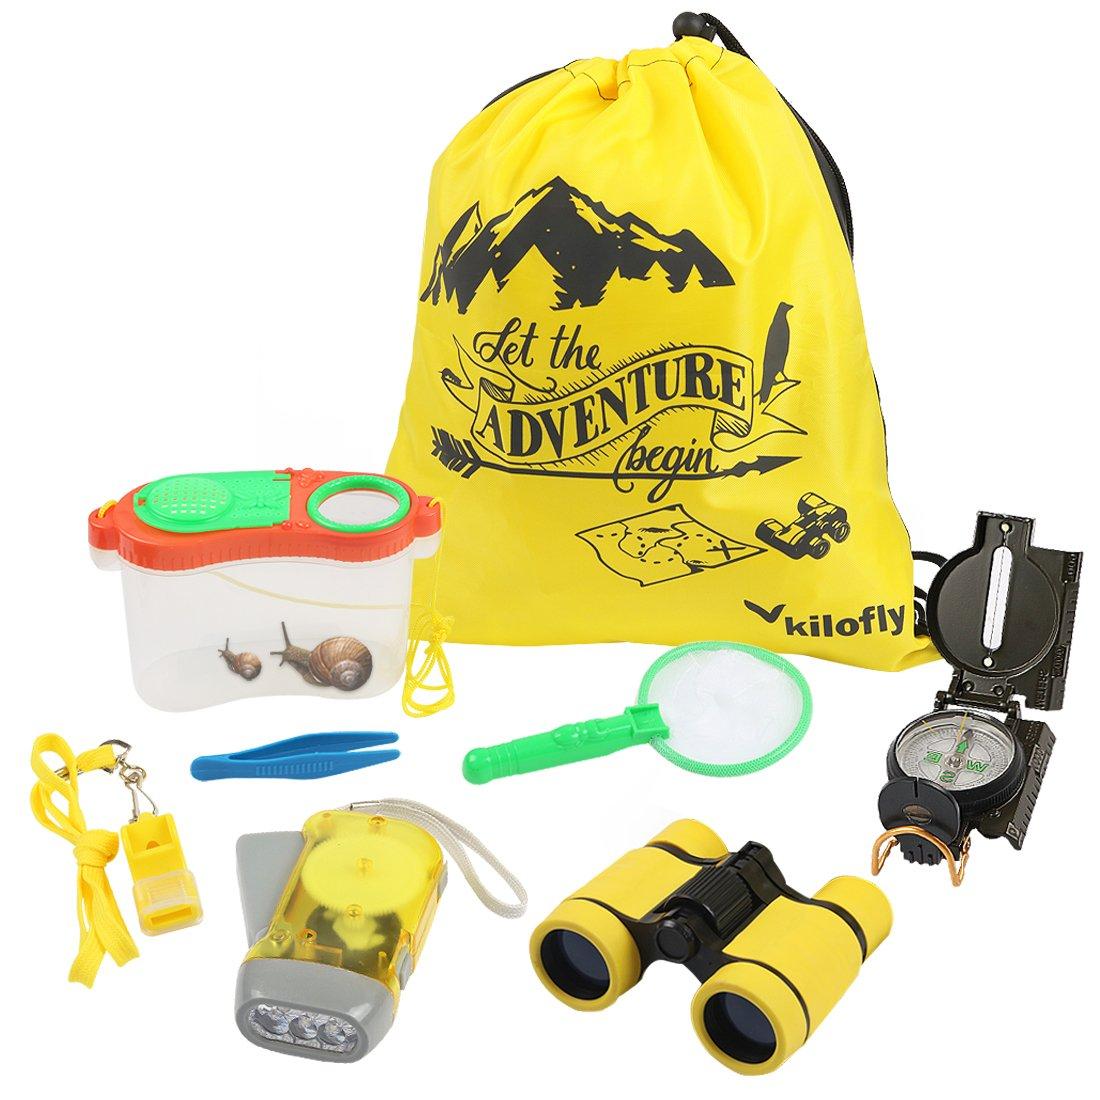 kilofly 8-in-1 Kids Nature Explorer Kit Fun Backyard Bug Catching Adventure Set